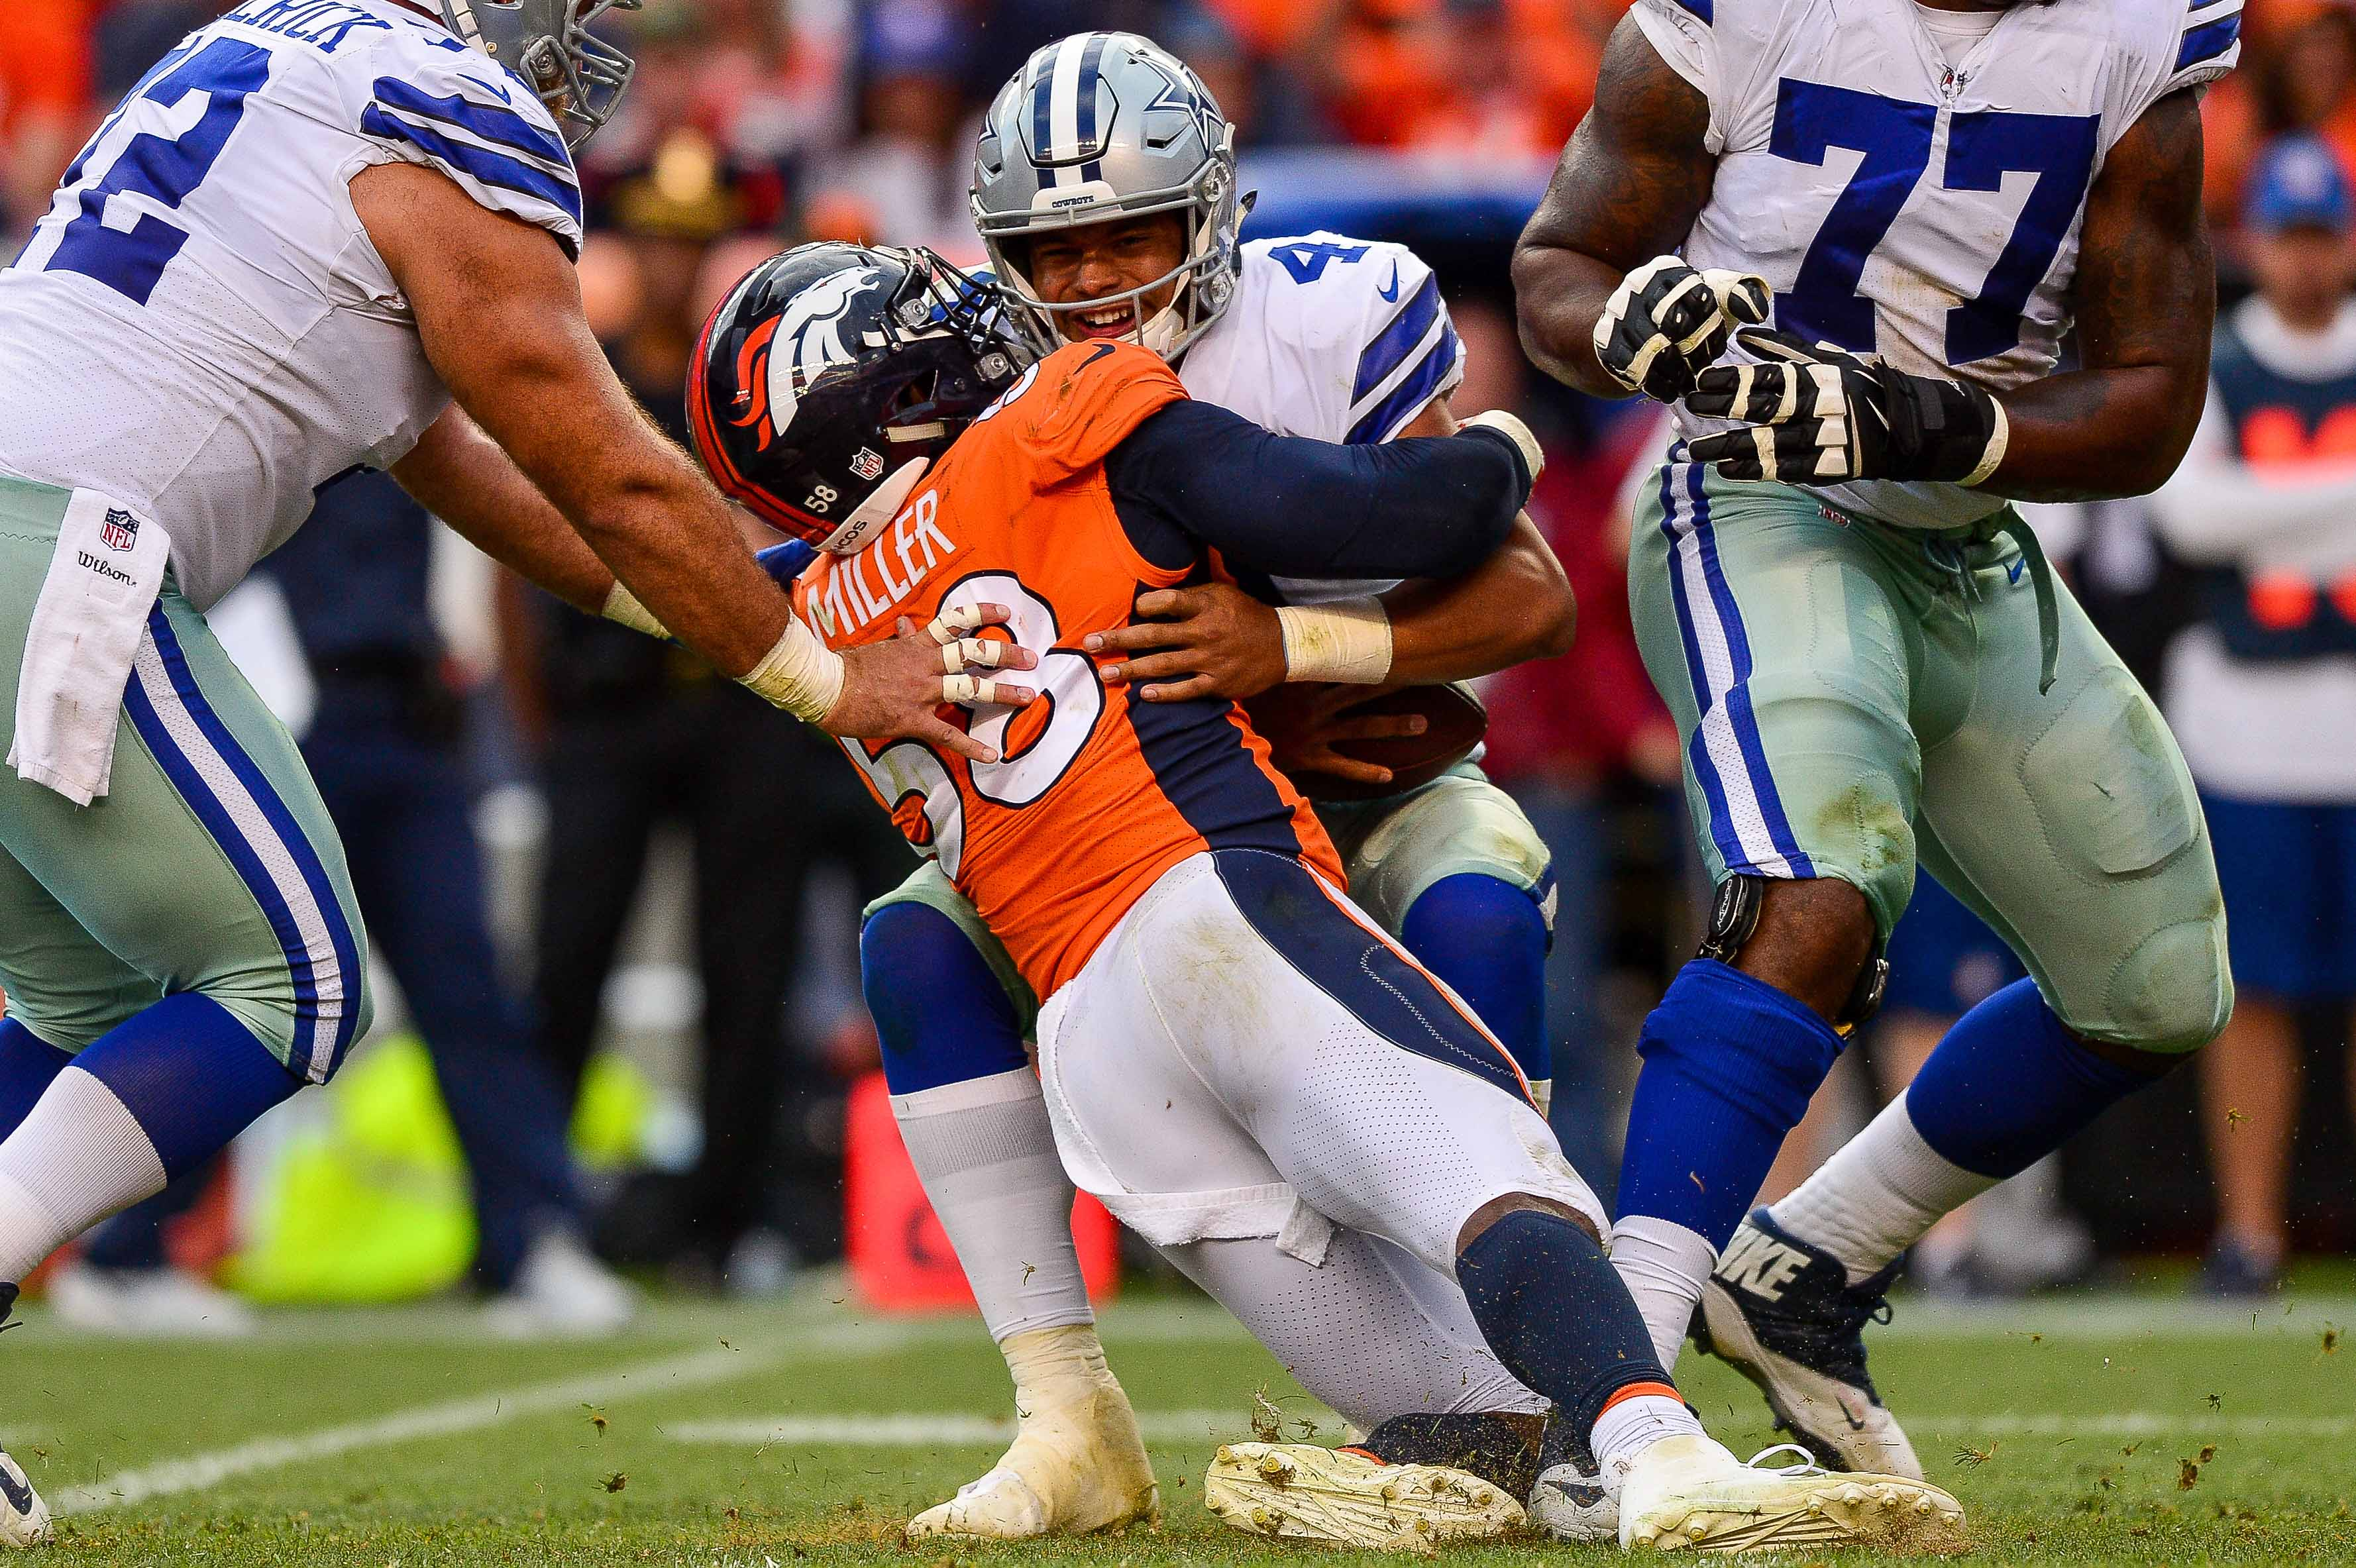 Dallas Cowboys-Denver Broncos game temporarily suspended because of lightning